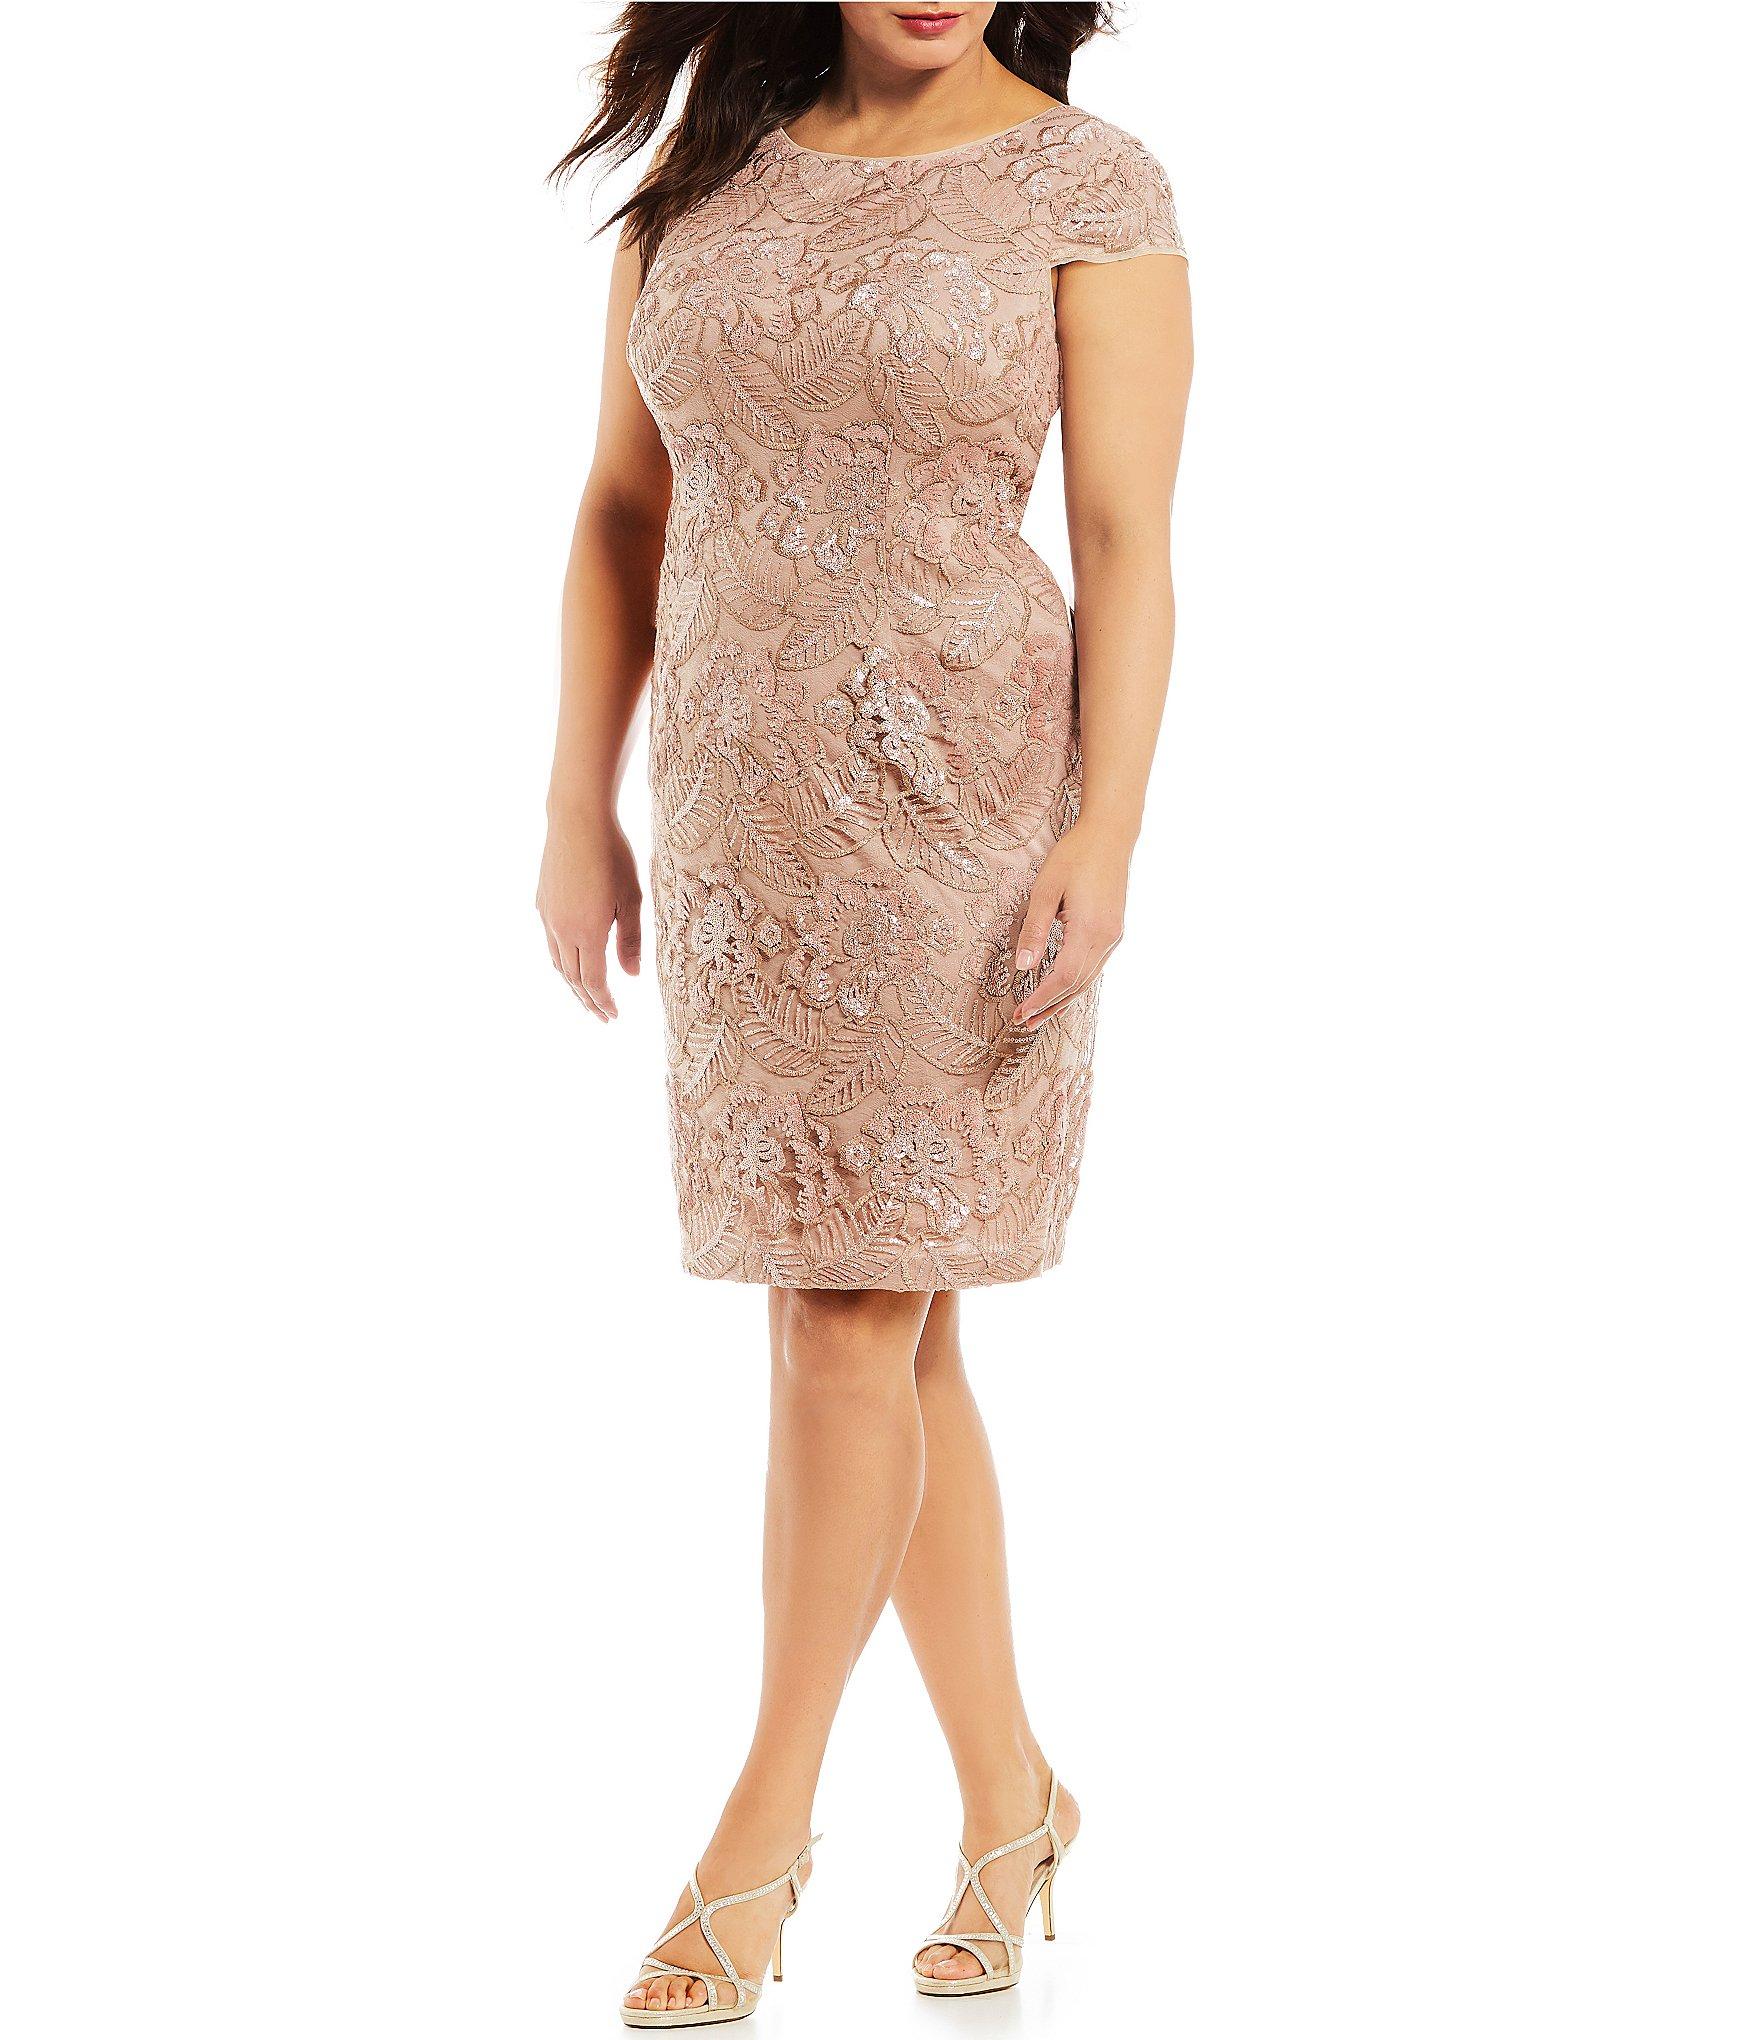 b2bd5b149ea04 Pink Women s Plus-Size Dresses   Gowns